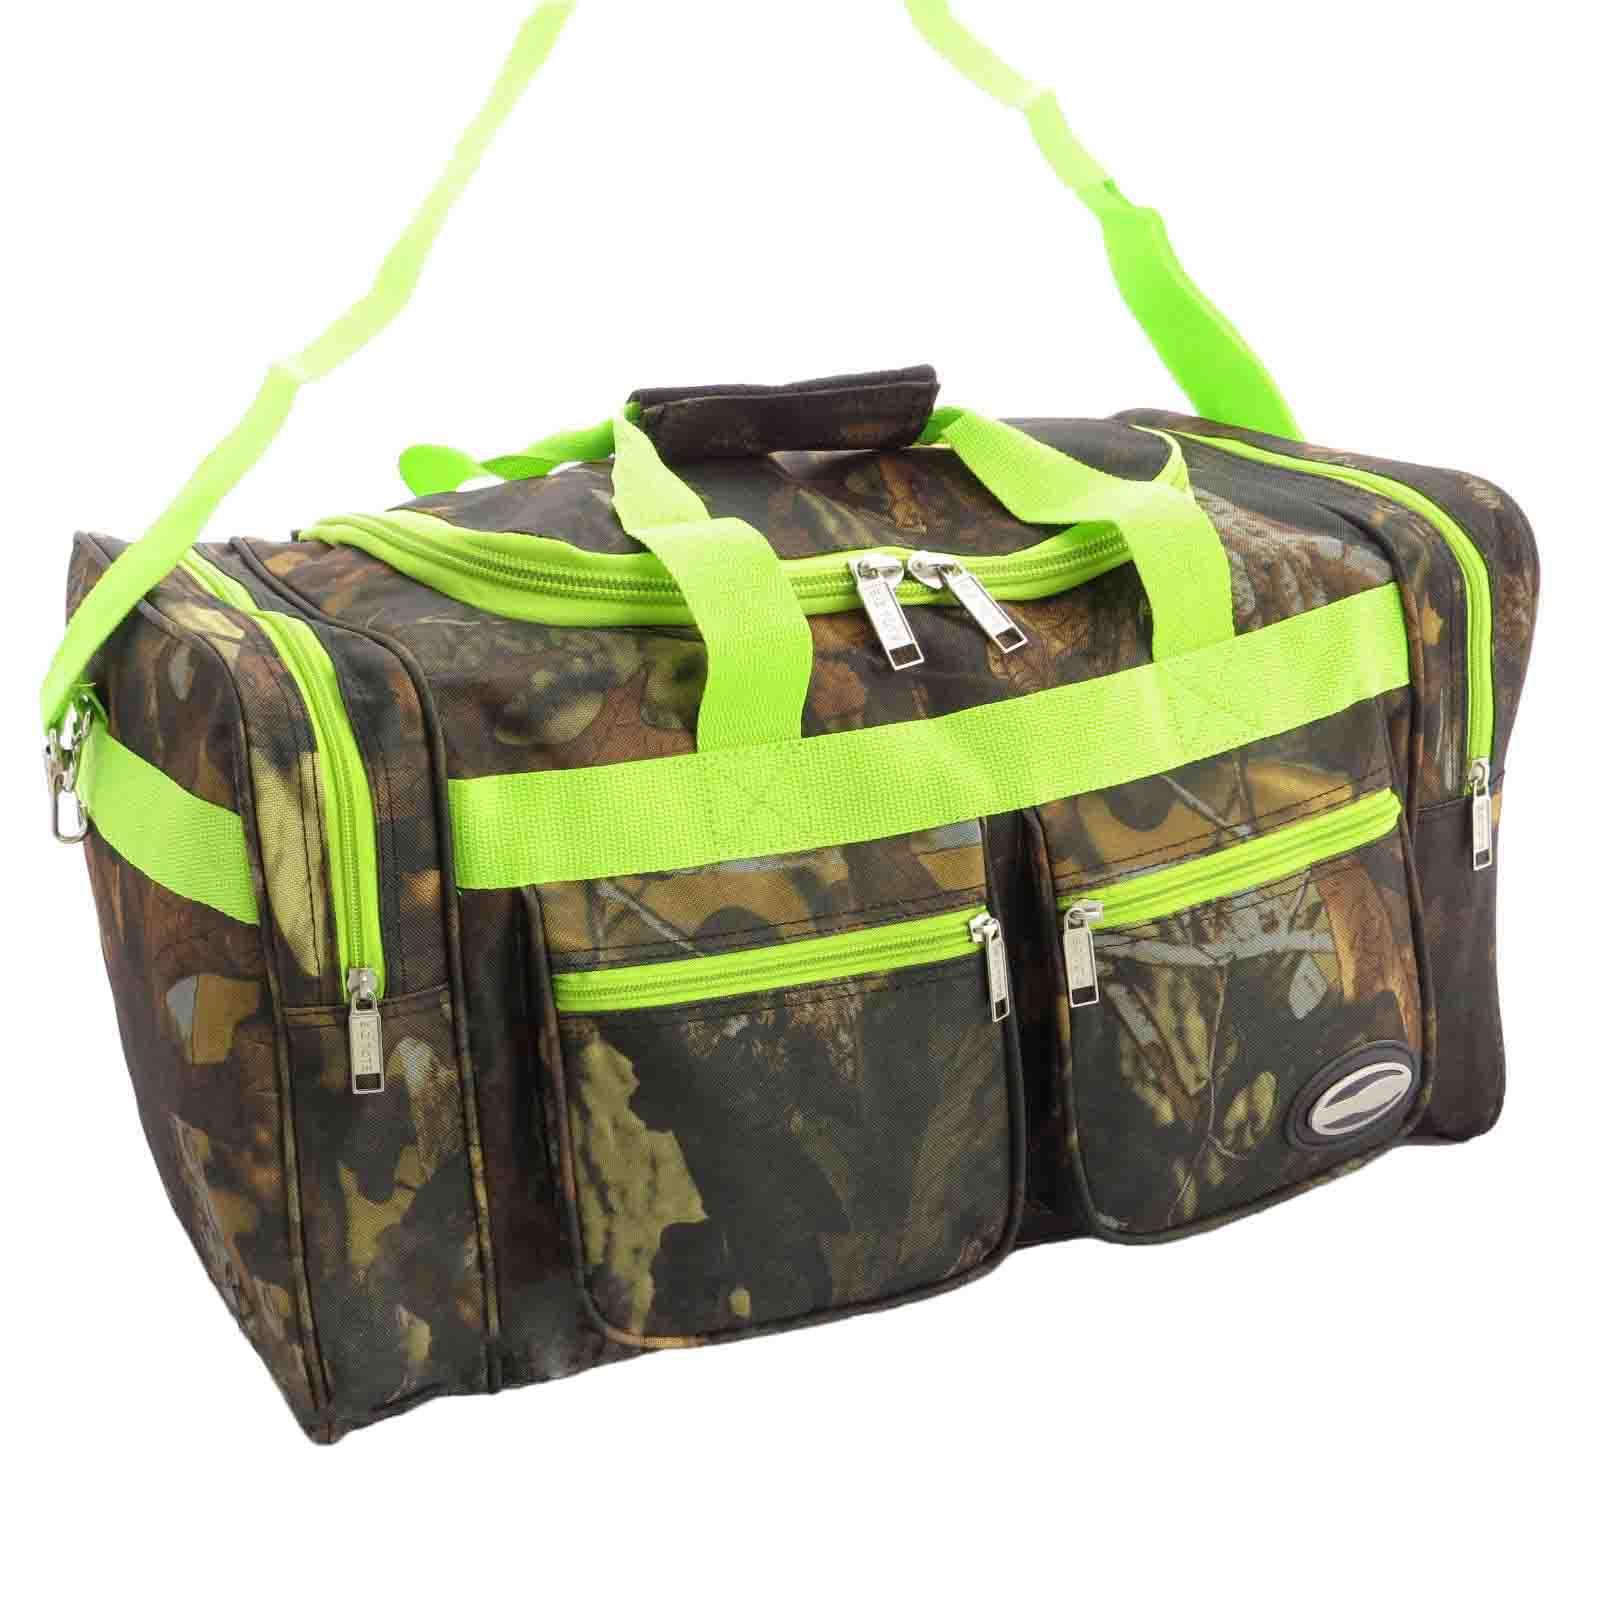 Lime green camo bedding lime camo the swamp company - Lime Green Camo Duffle Bag